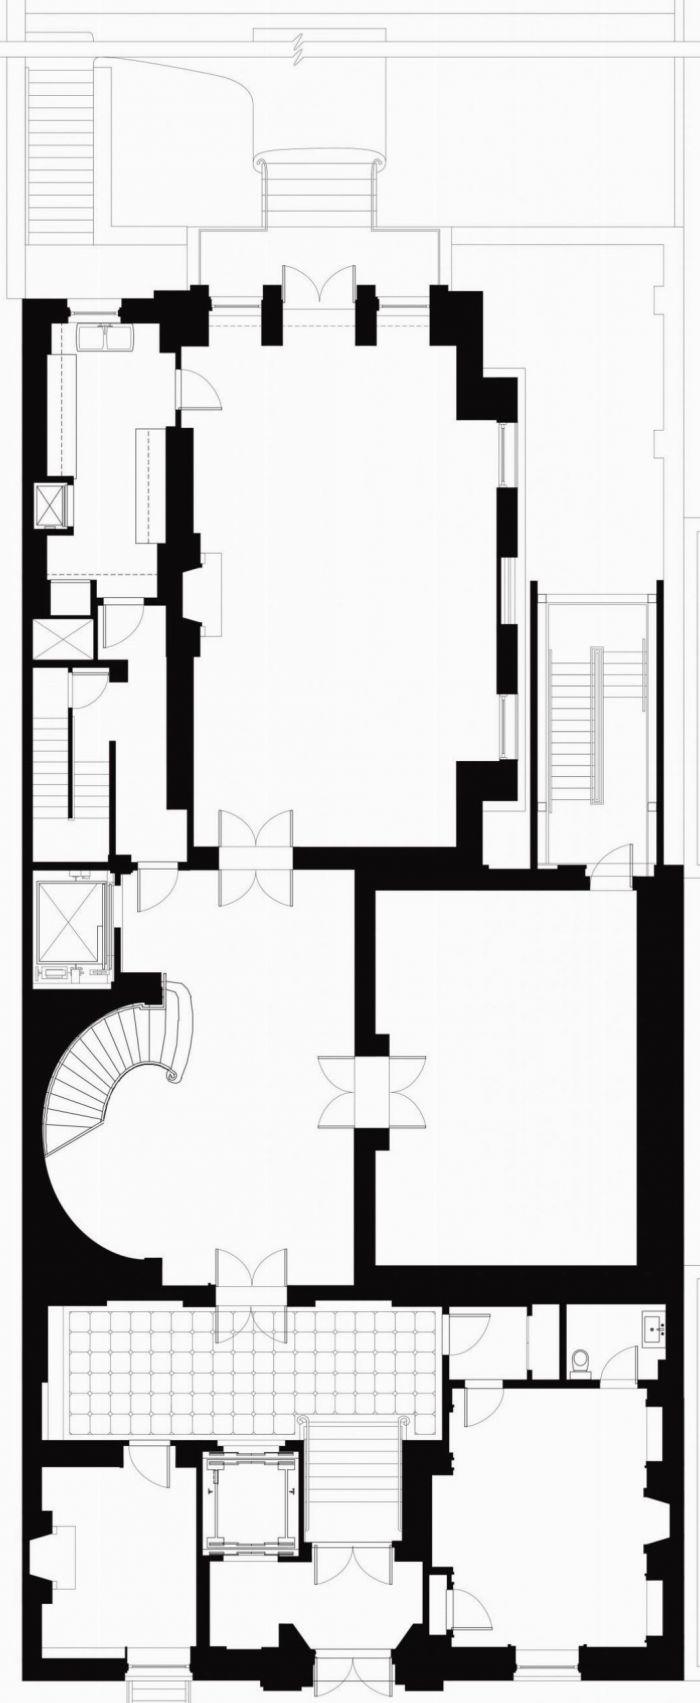 New York University ISAW Ground Floor Plan